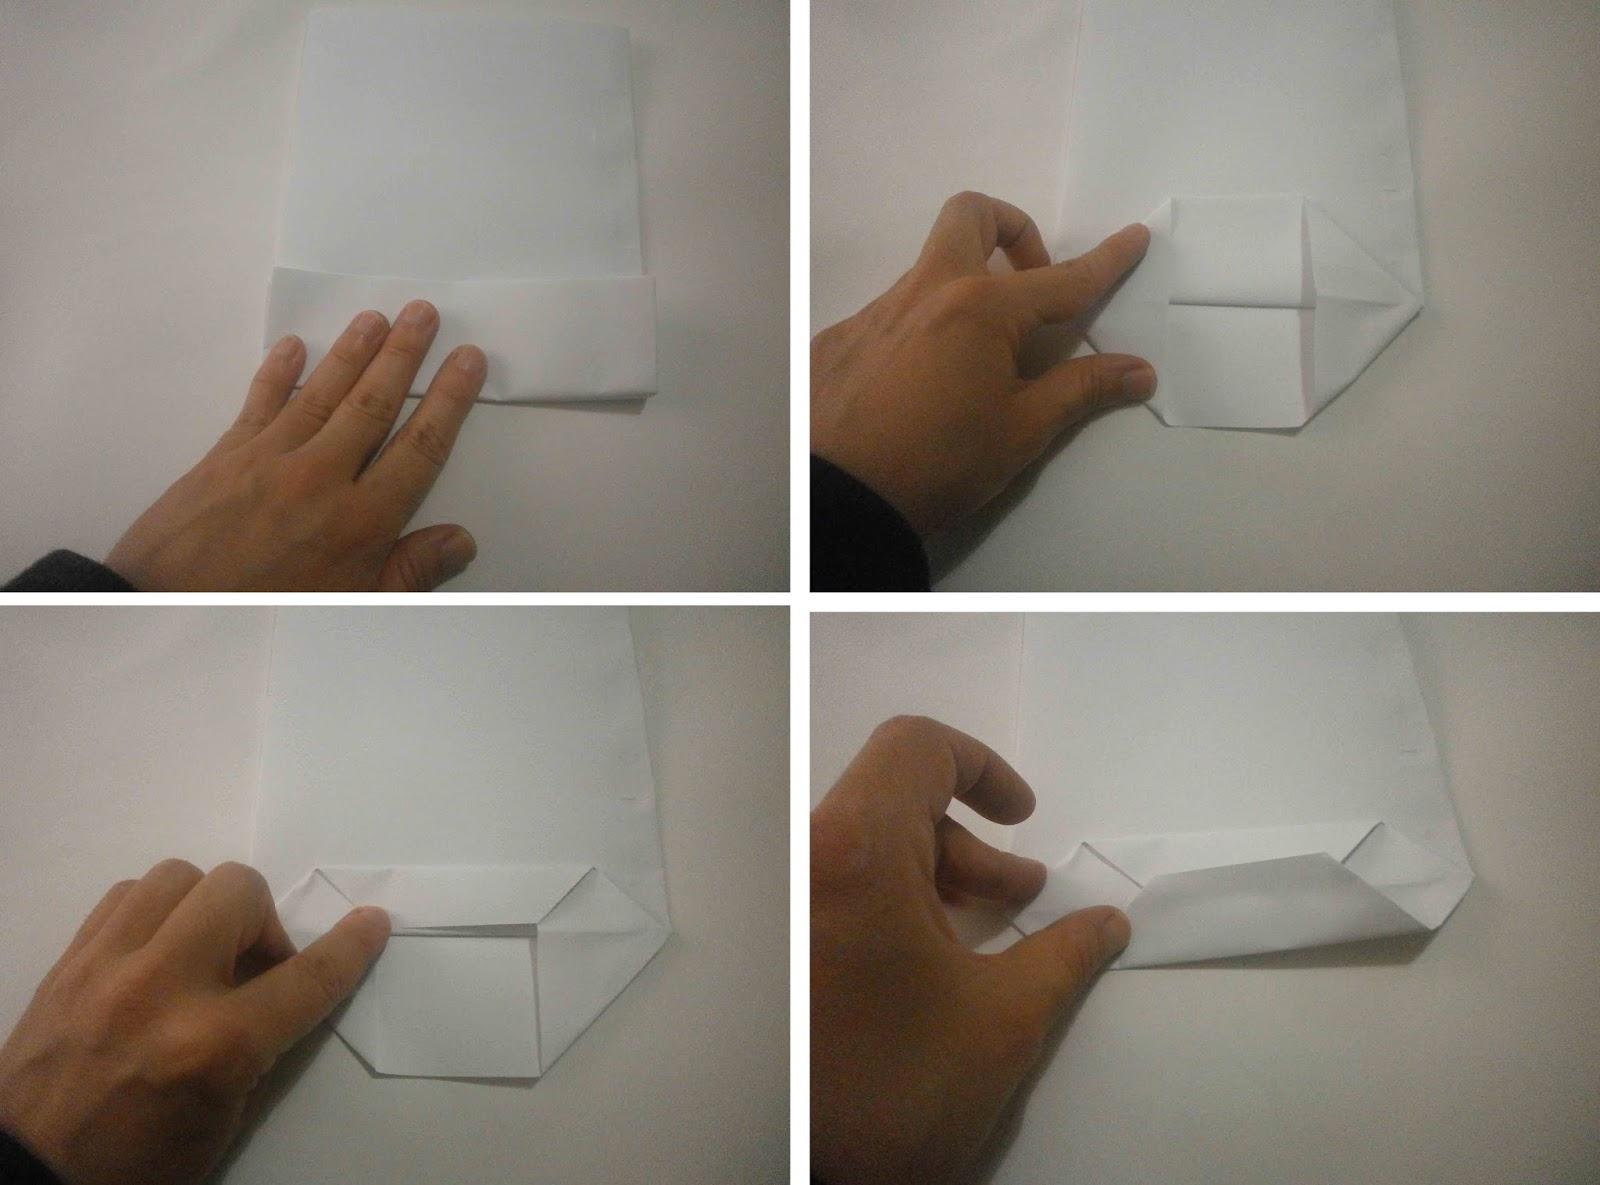 Como hacer bolsas de papel para regalo ideas faciles y - Bolsa de papel para regalo ...